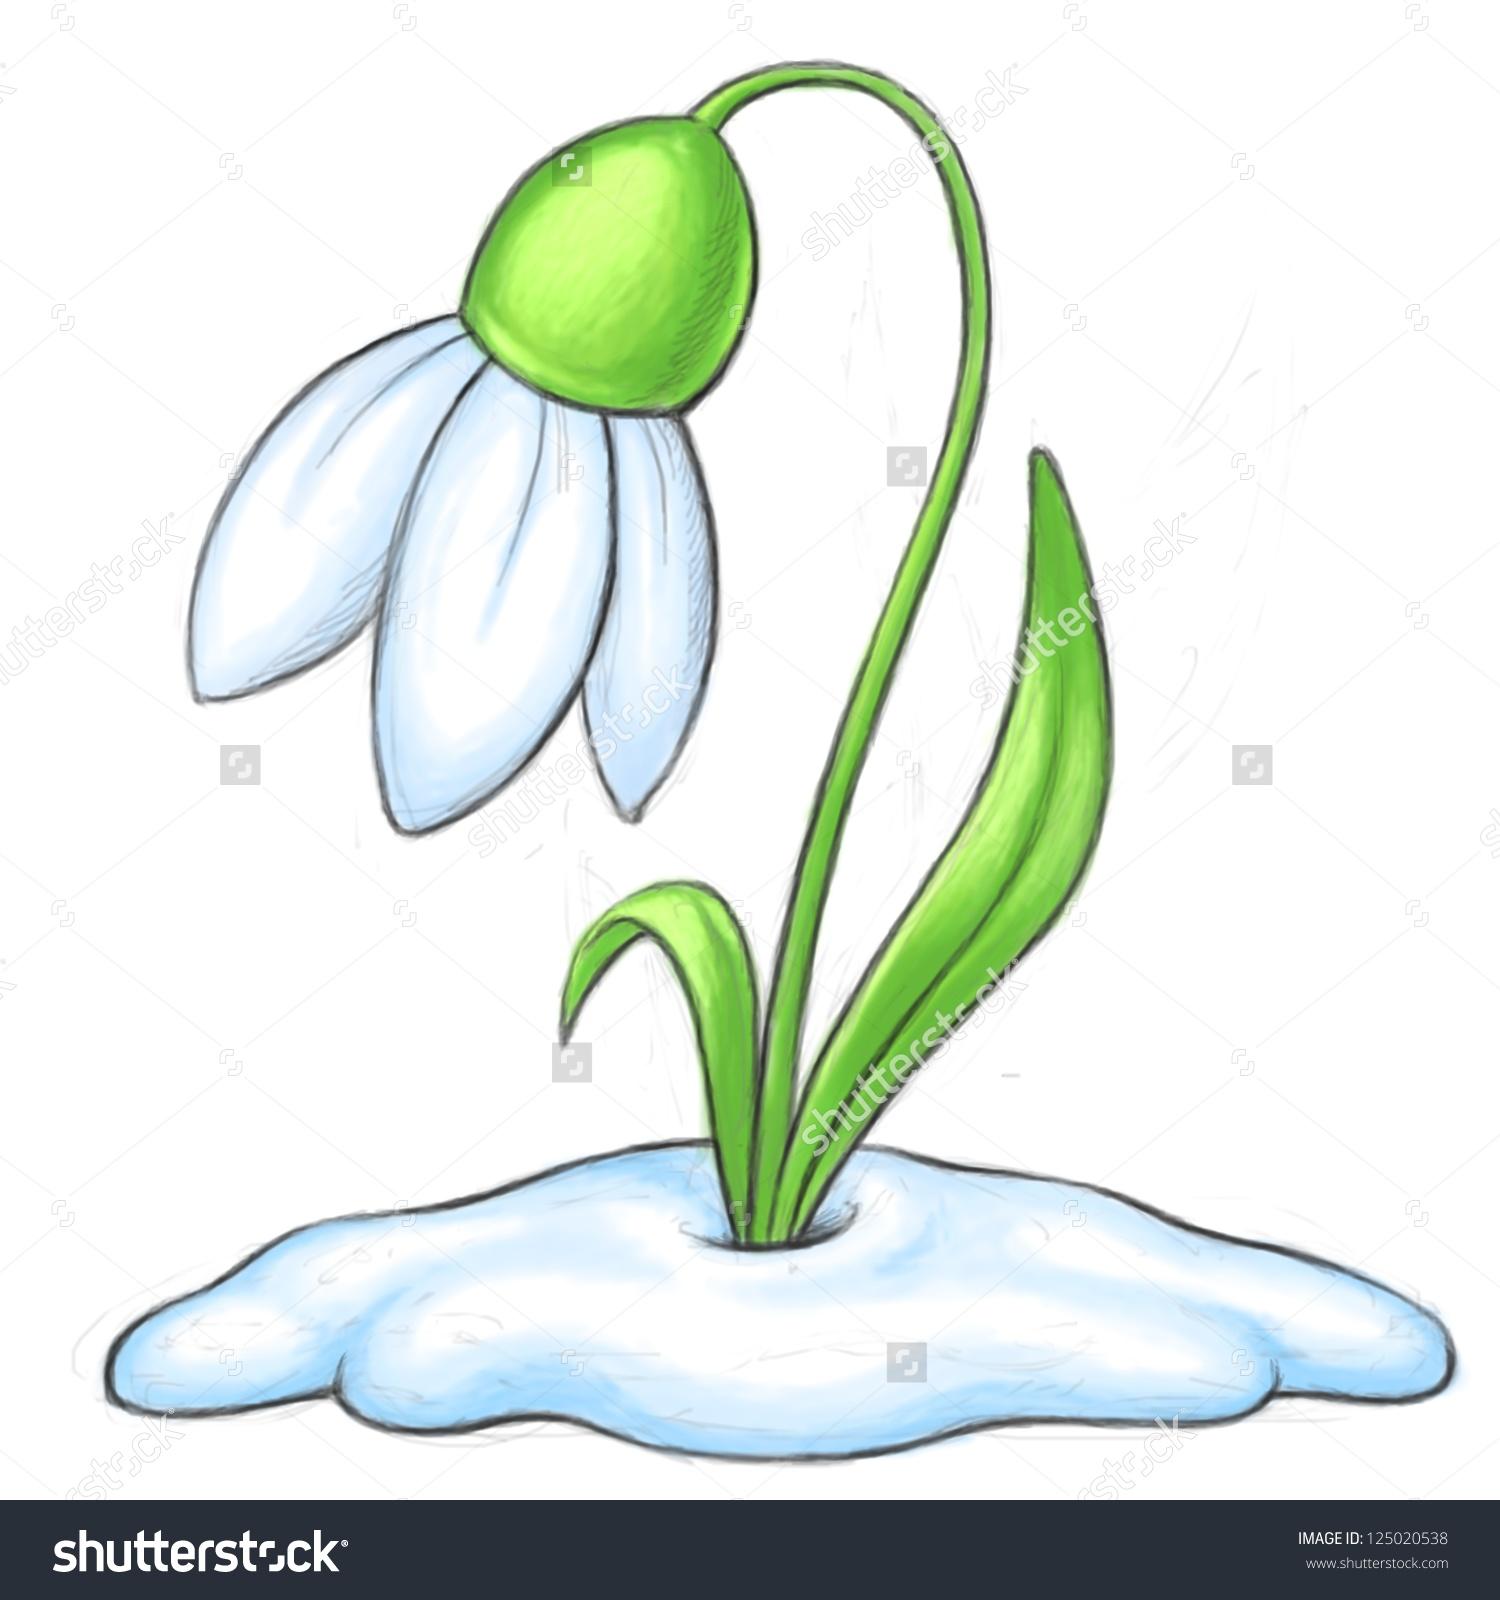 Snowdrop Cartoon Illustration Bitmap Clipart Stock Illustration.